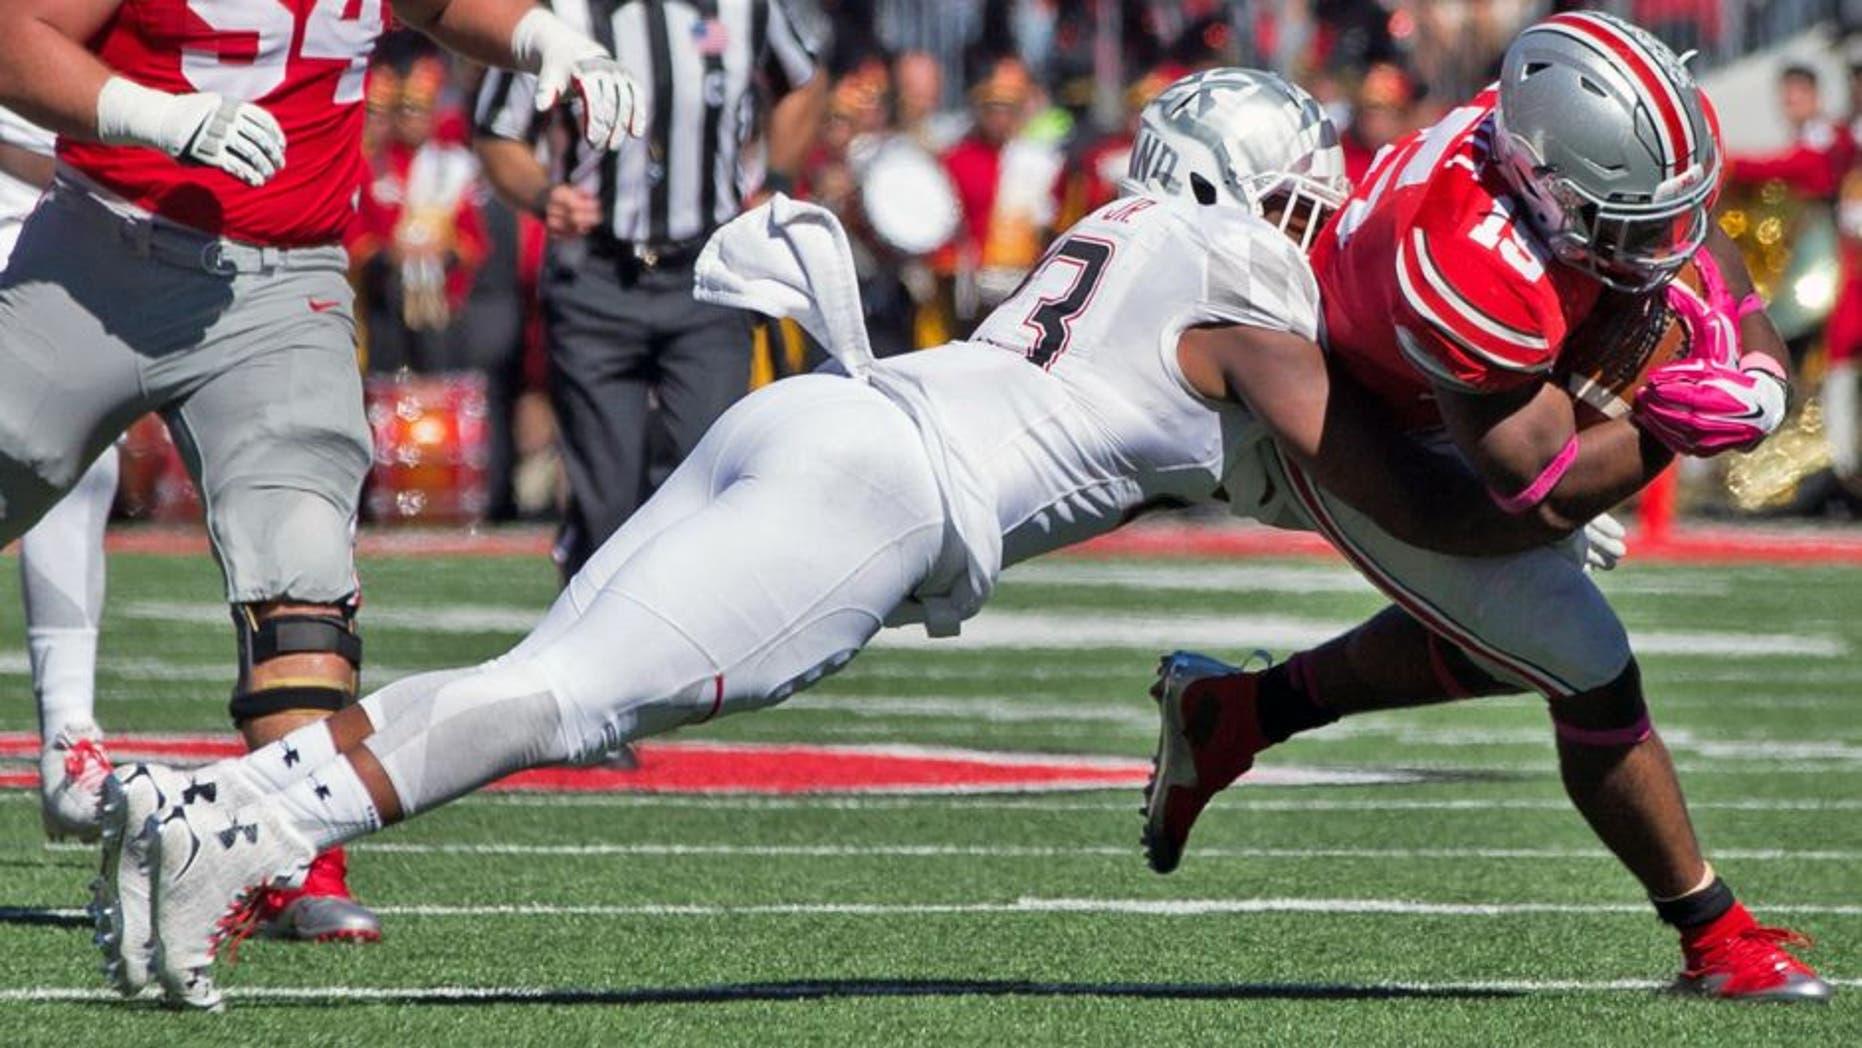 Oct 10, 2015; Columbus, OH, USA; Maryland Terrapins linebacker Jermaine Carter Jr. (23) tackles Ohio State Buckeyes running back Ezekiel Elliott (15) at Ohio Stadium. Mandatory Credit: Greg Bartram-USA TODAY Sports